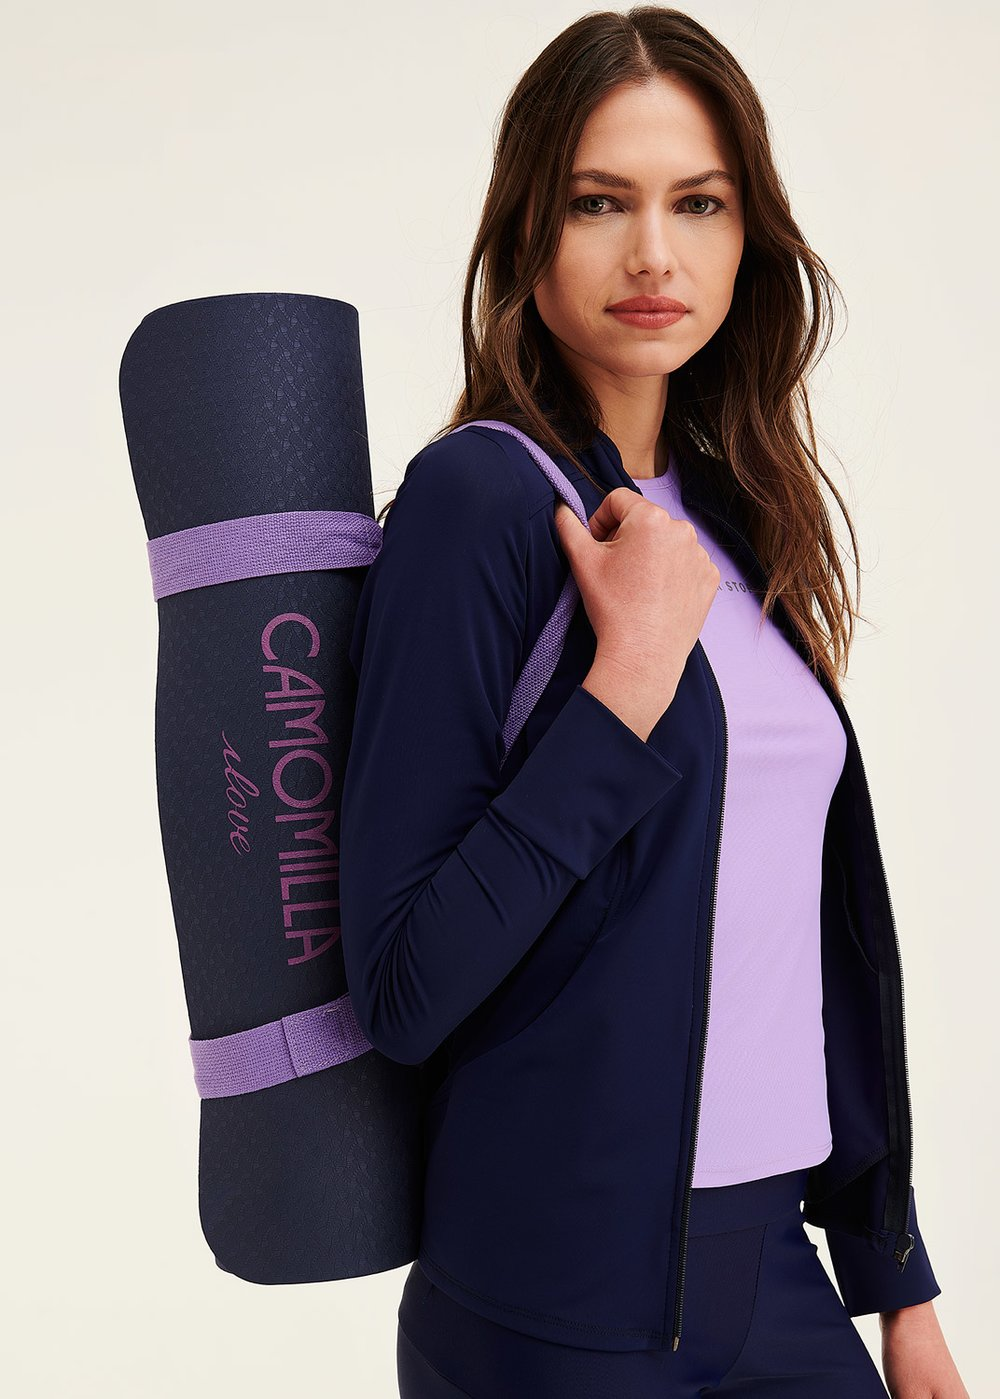 Yoga mat with logo - Oltremare /  Lavanda - Woman